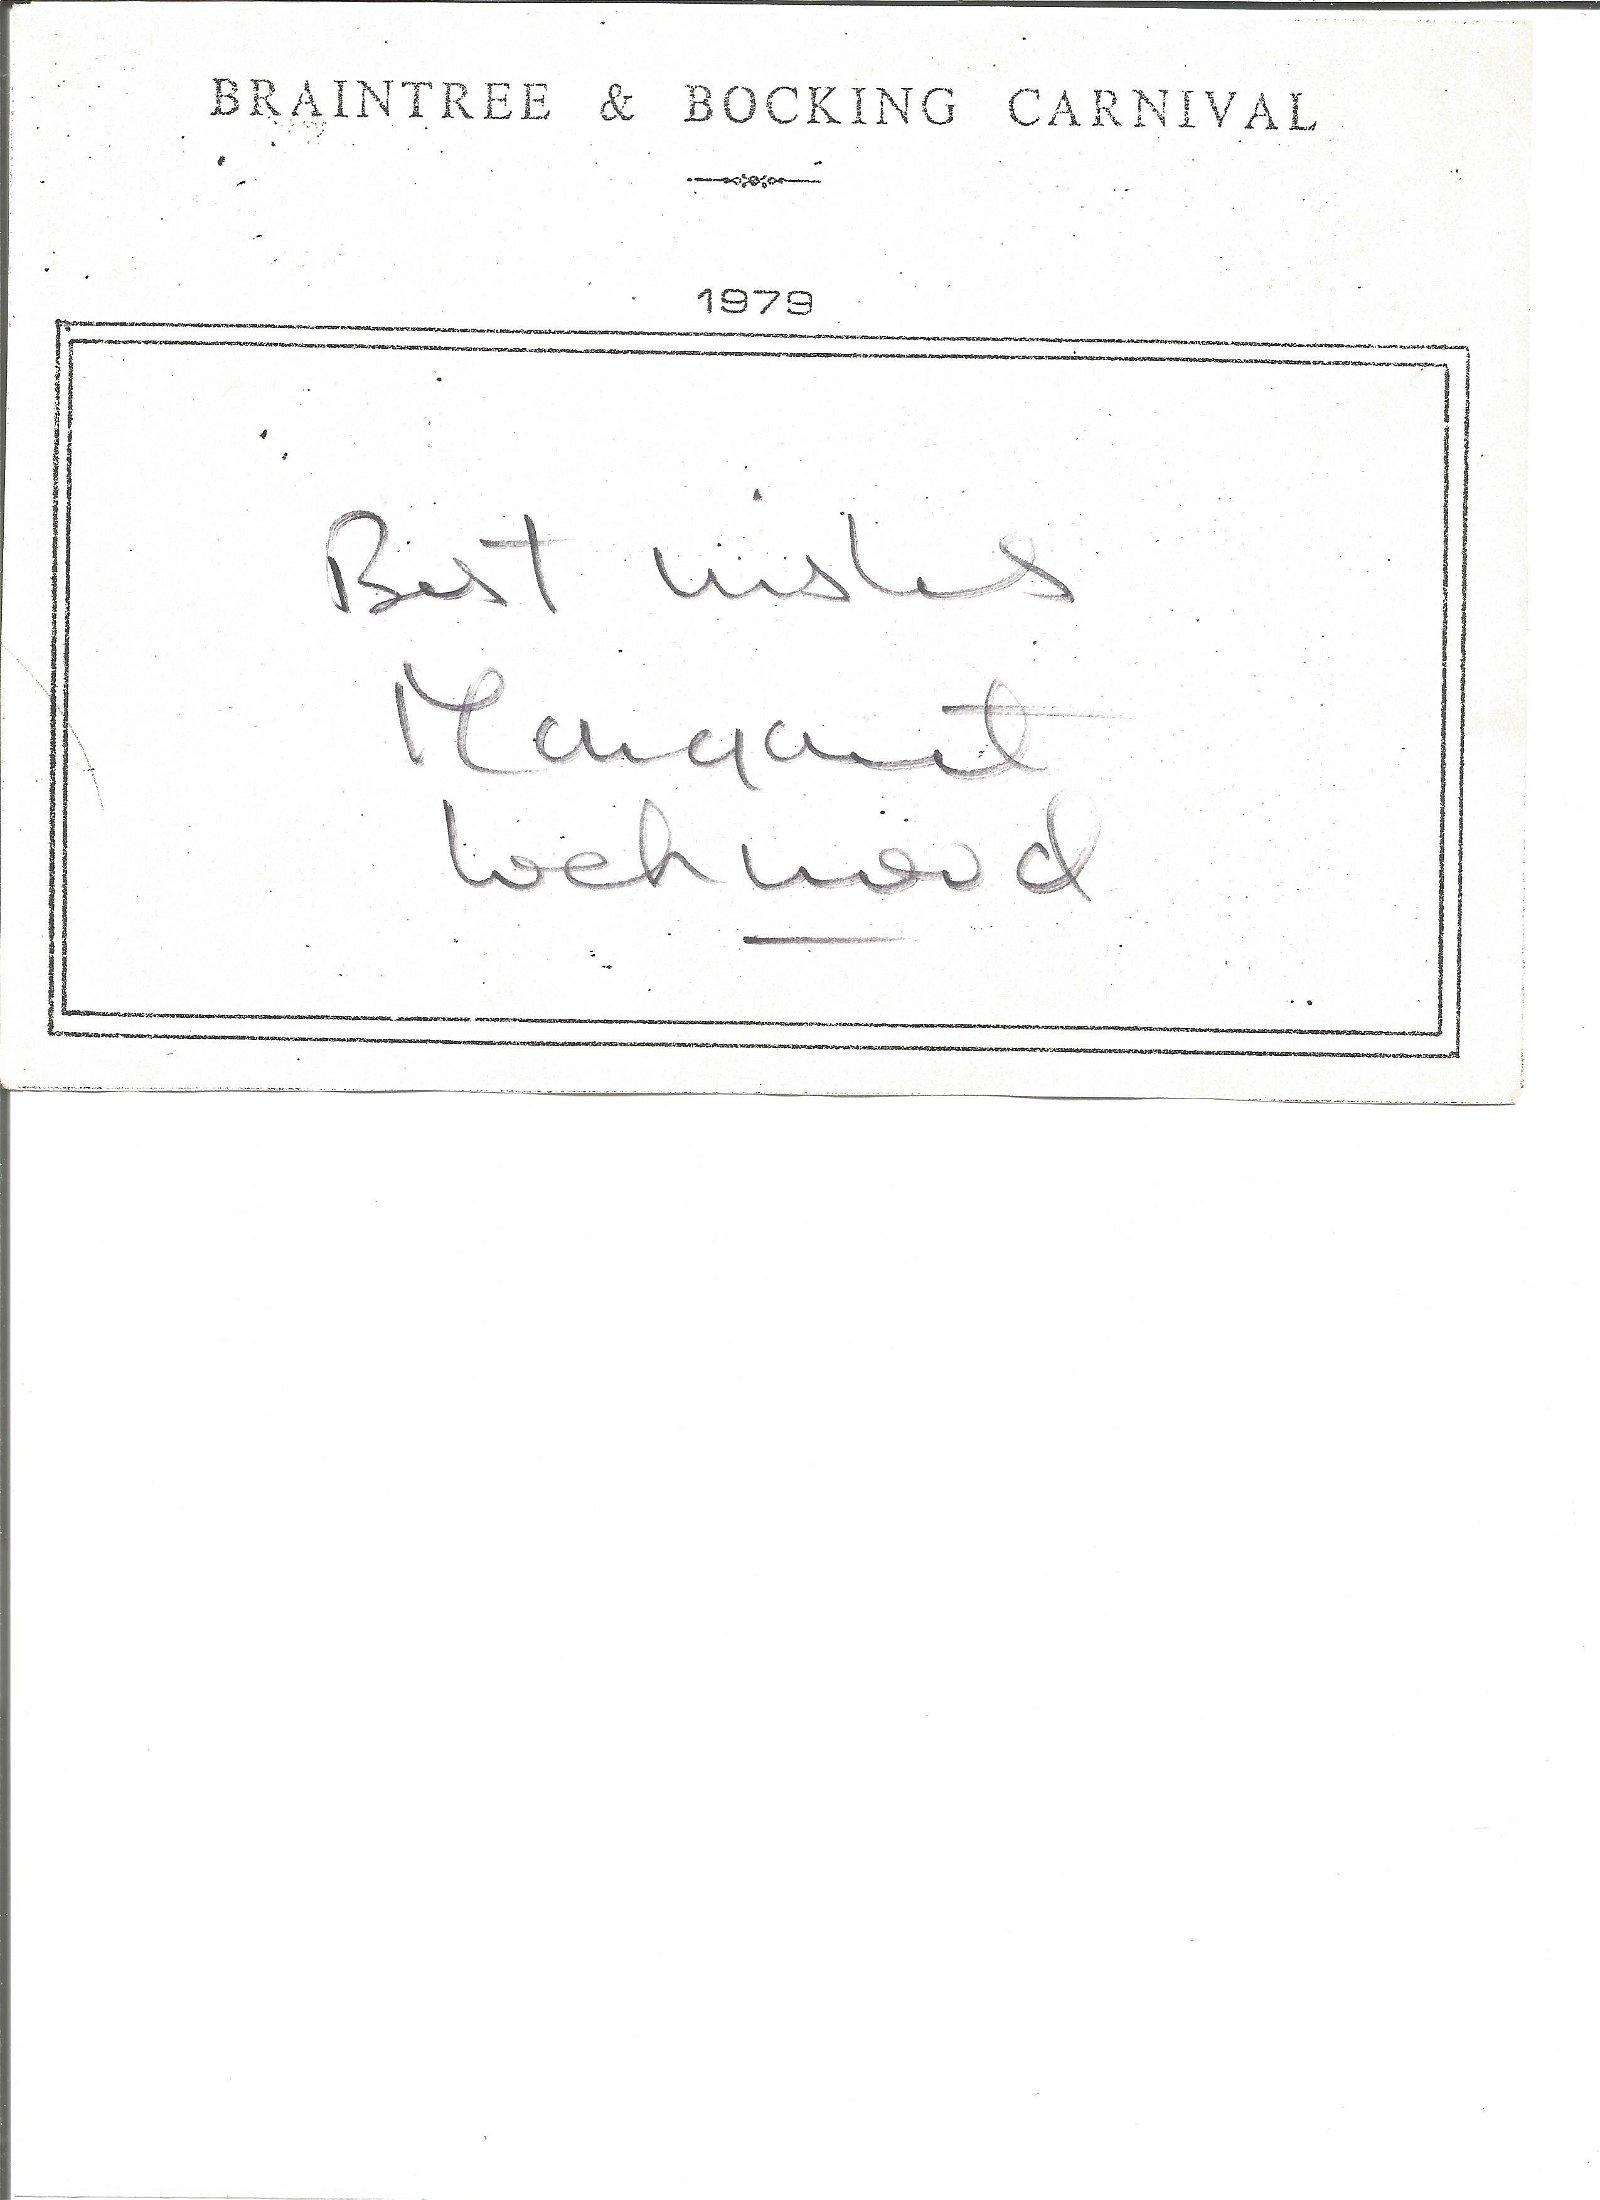 Margaret Lockwood large signature piece with 10x8 black